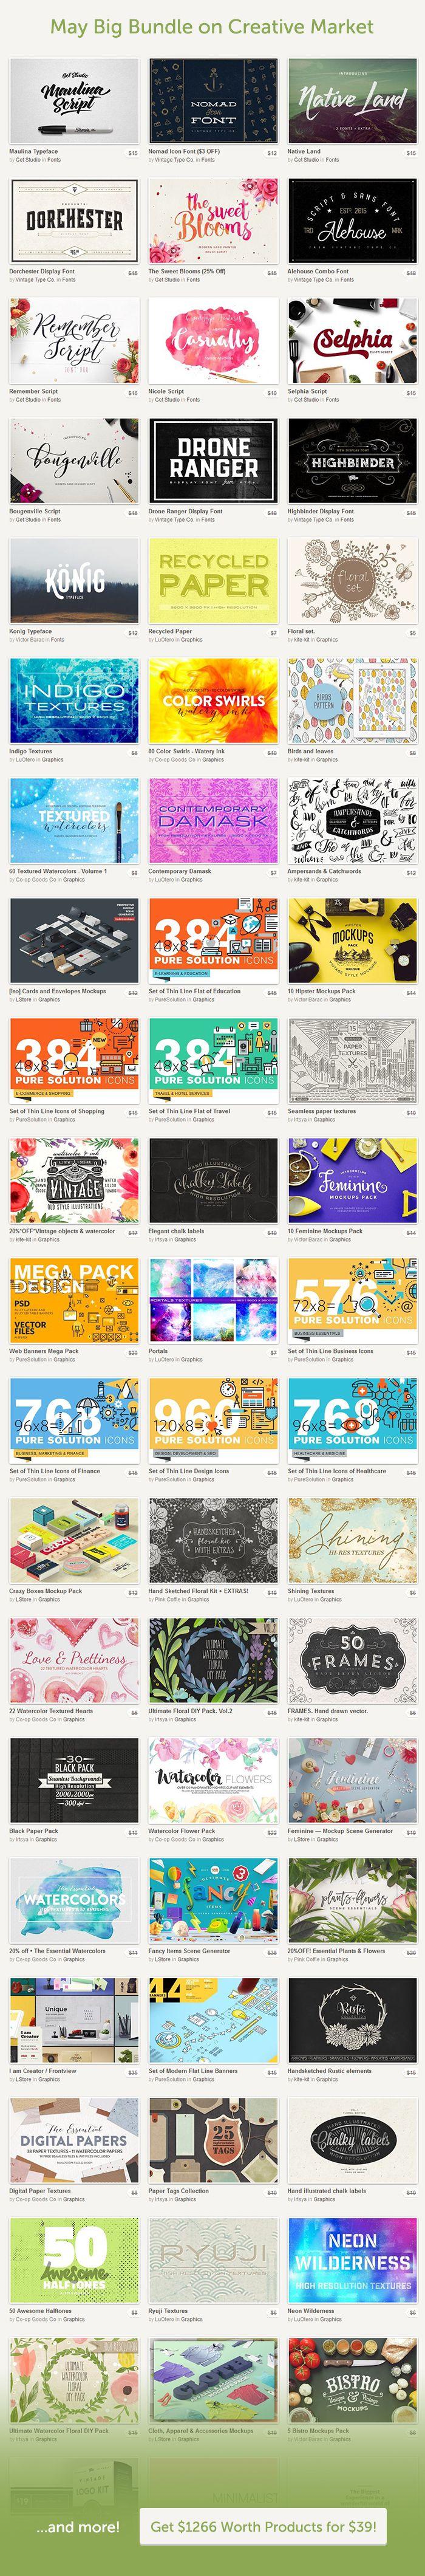 https://creativemarket.com/bundle/may-big-bundle-2016?u=friskweb